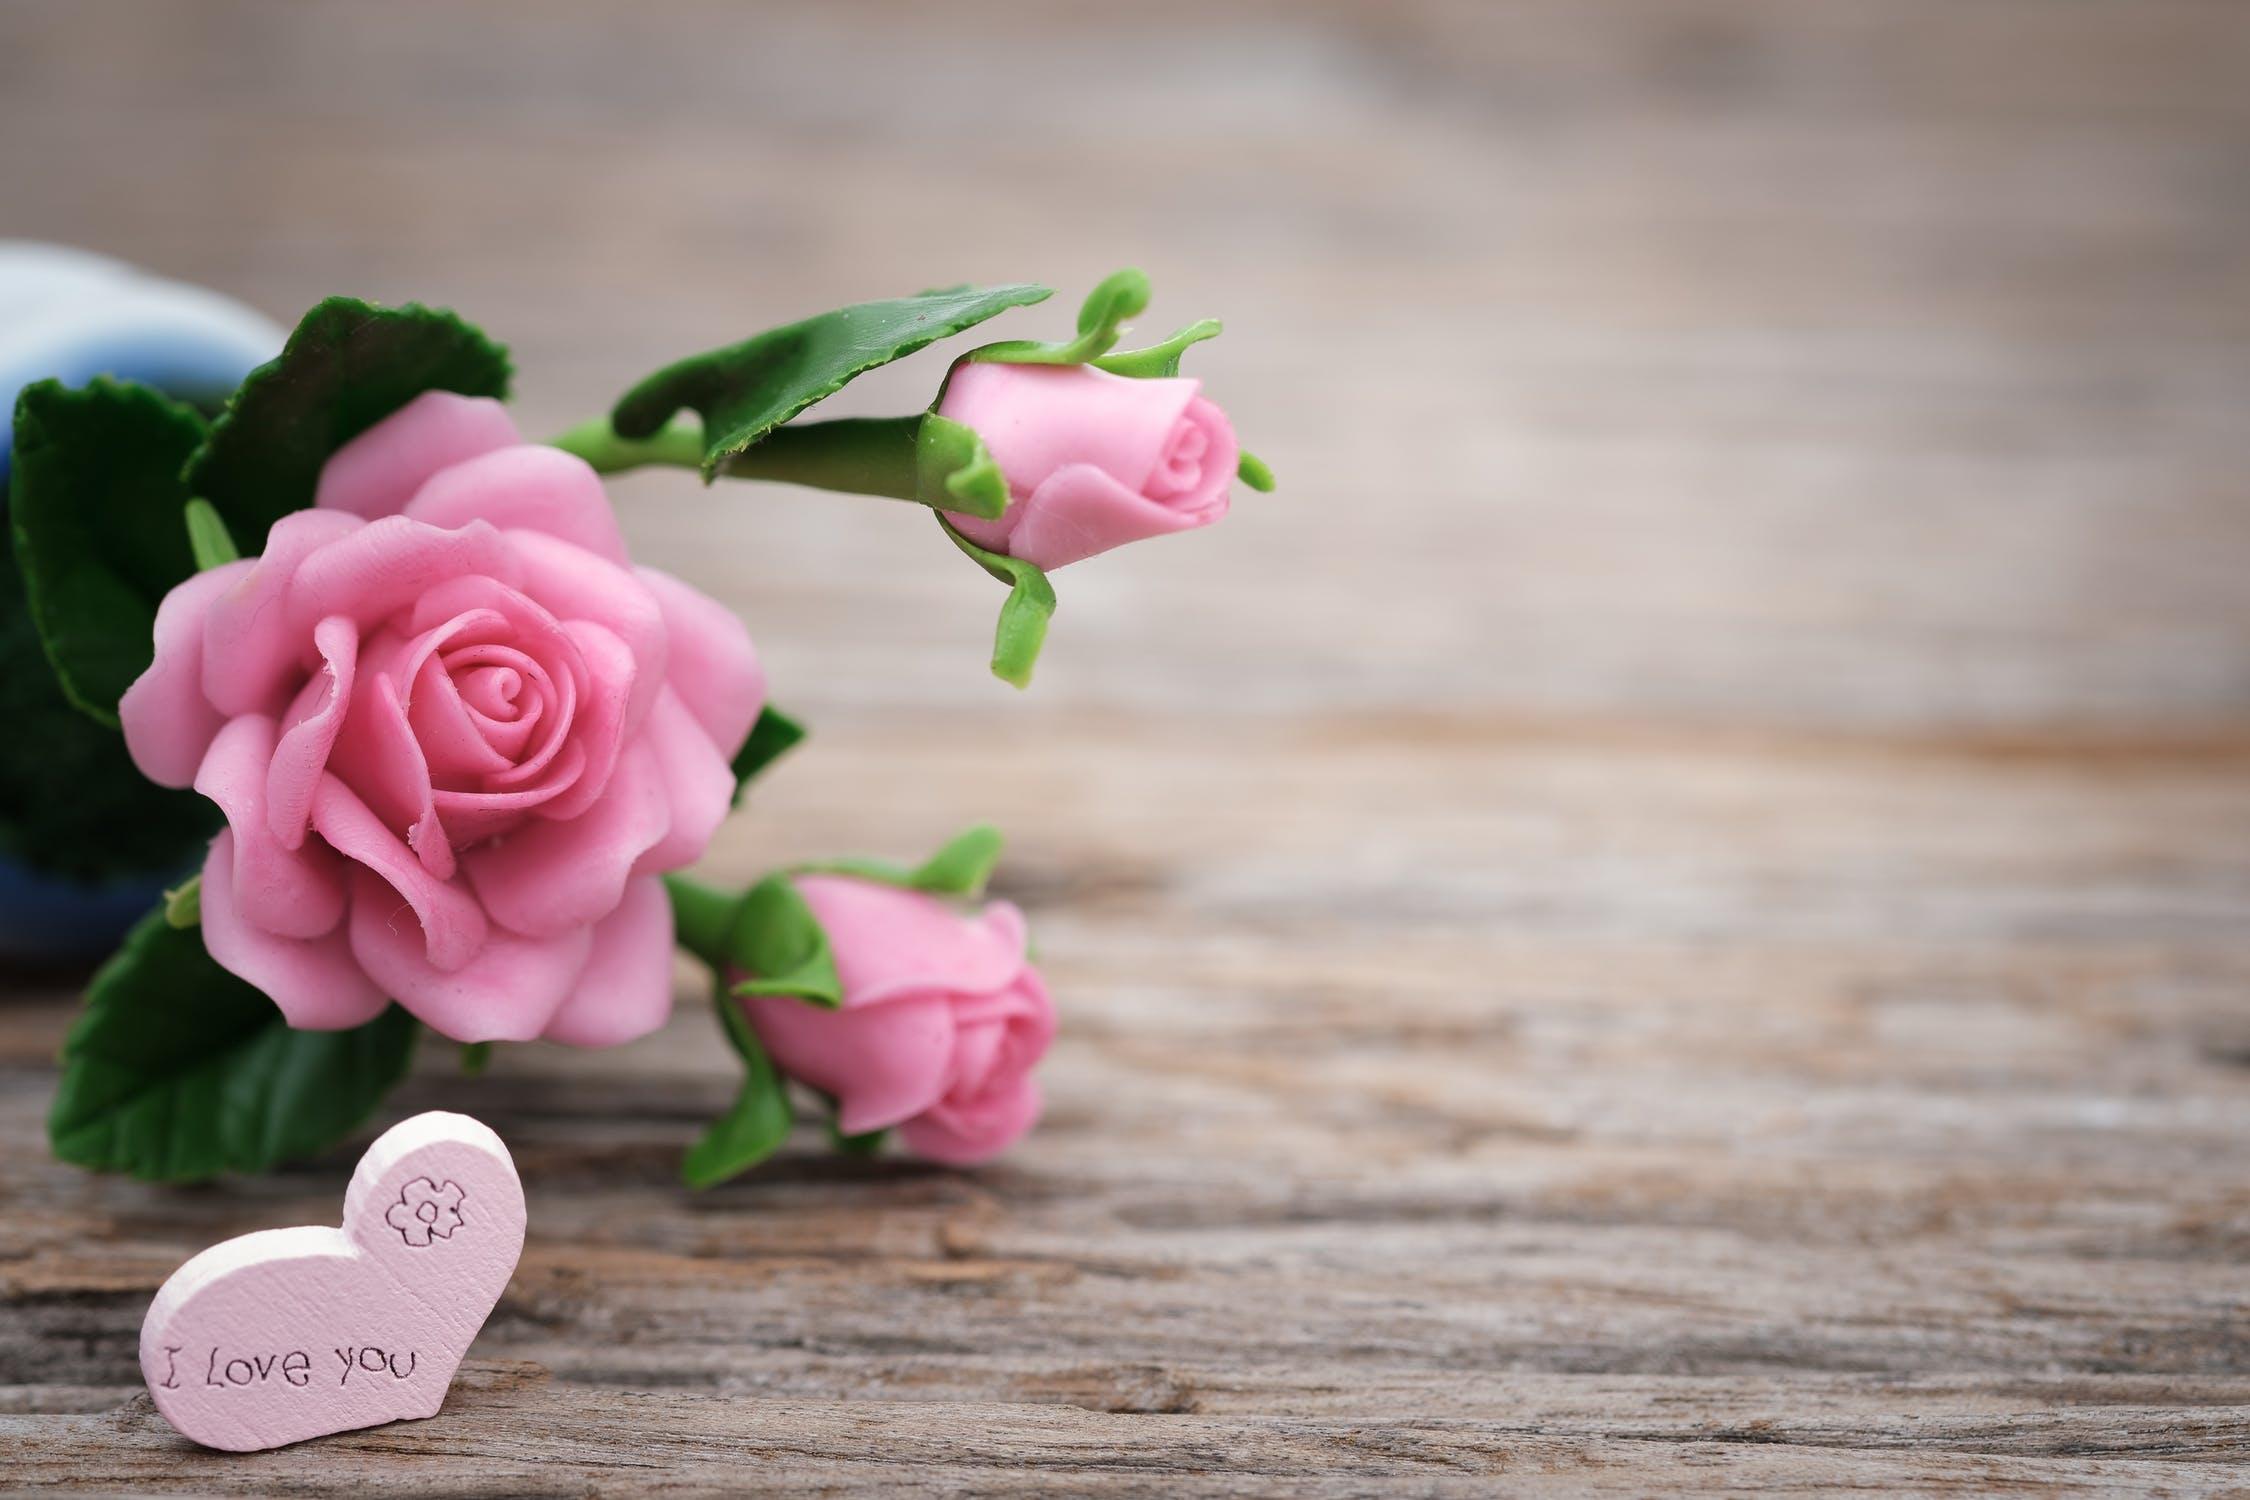 Surrey Florist Flower Delivery By Surrey Flower Shop